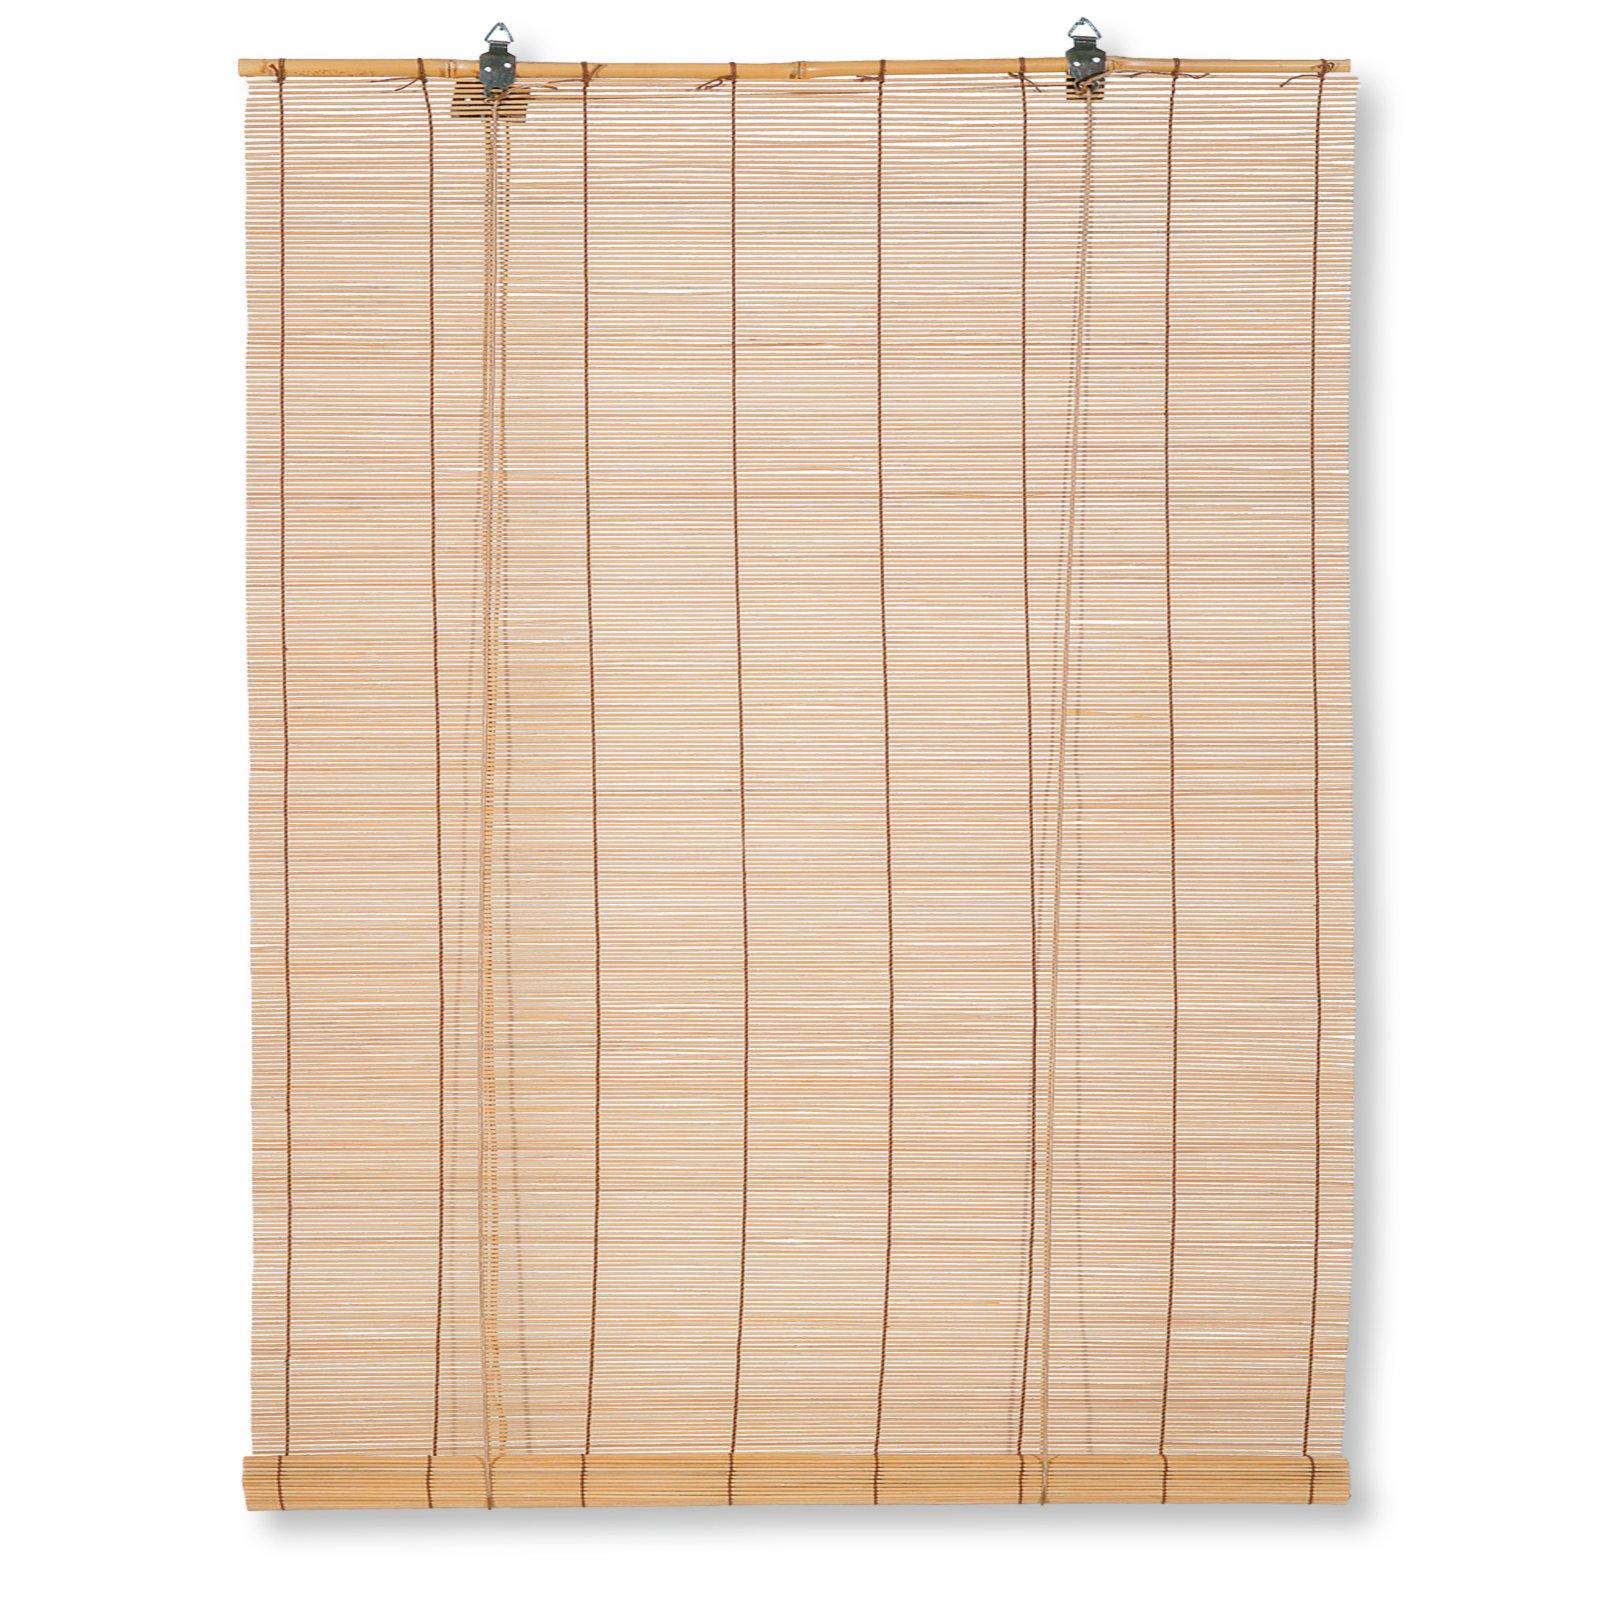 bambus raffrollo hellbraun 100x160 cm bambusrollos rollos jalousien deko haushalt